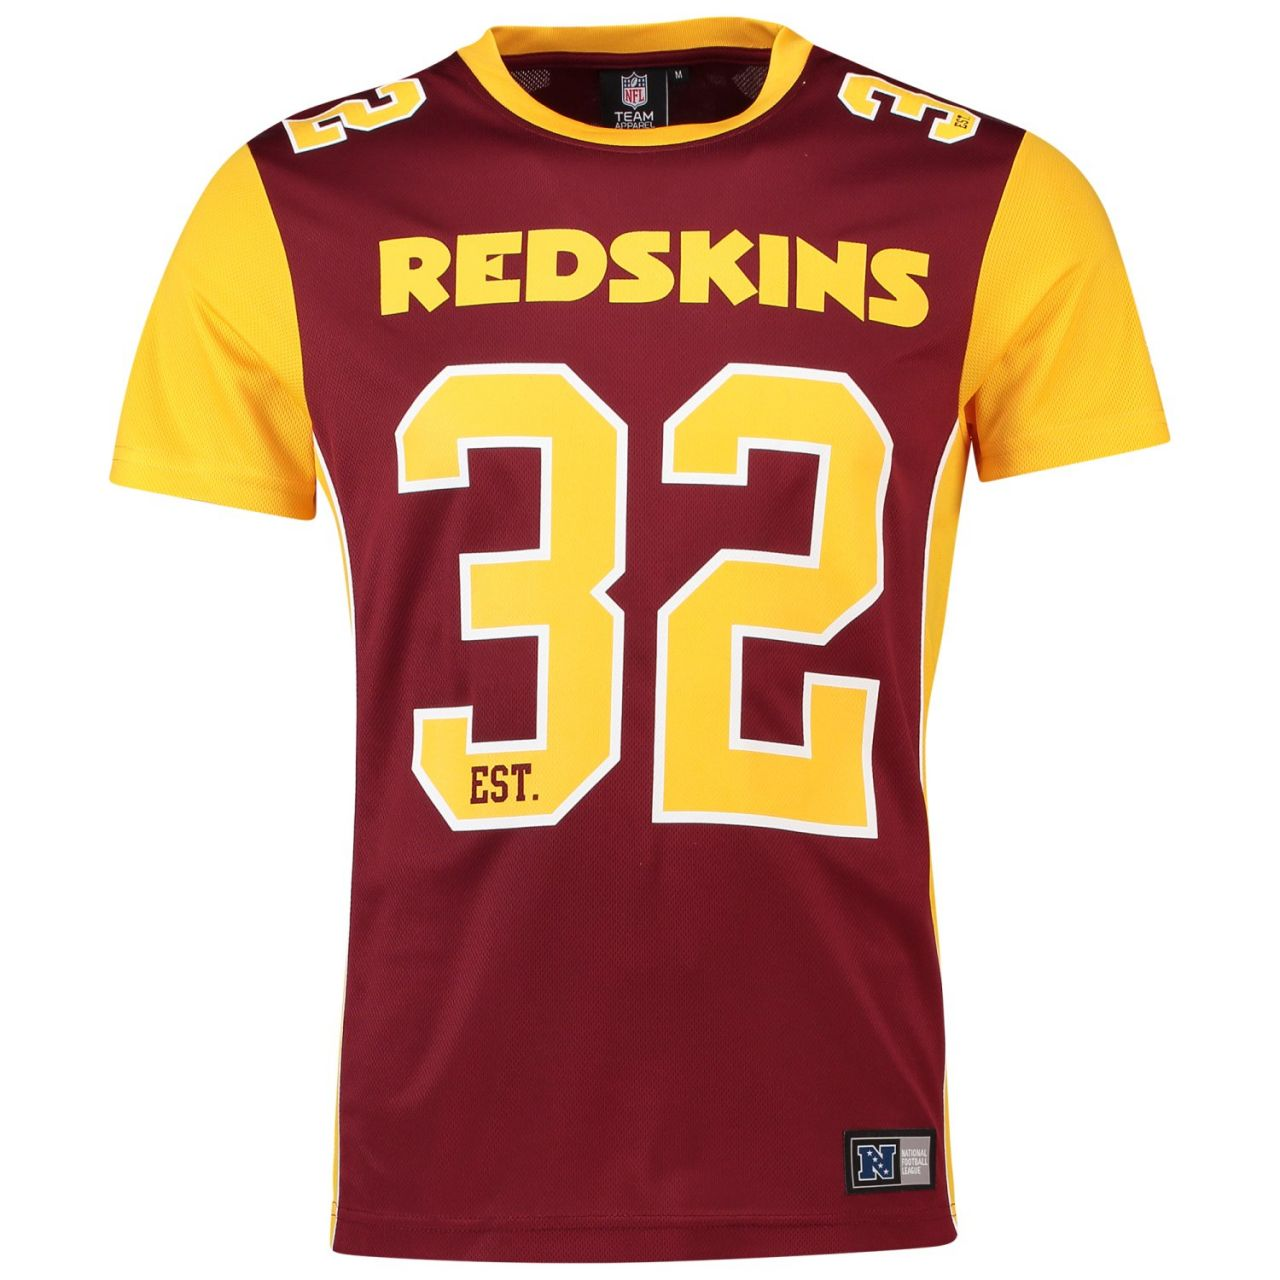 amfoo - Majestic Mesh Polyester Jersey Shirt - Washington Redskins